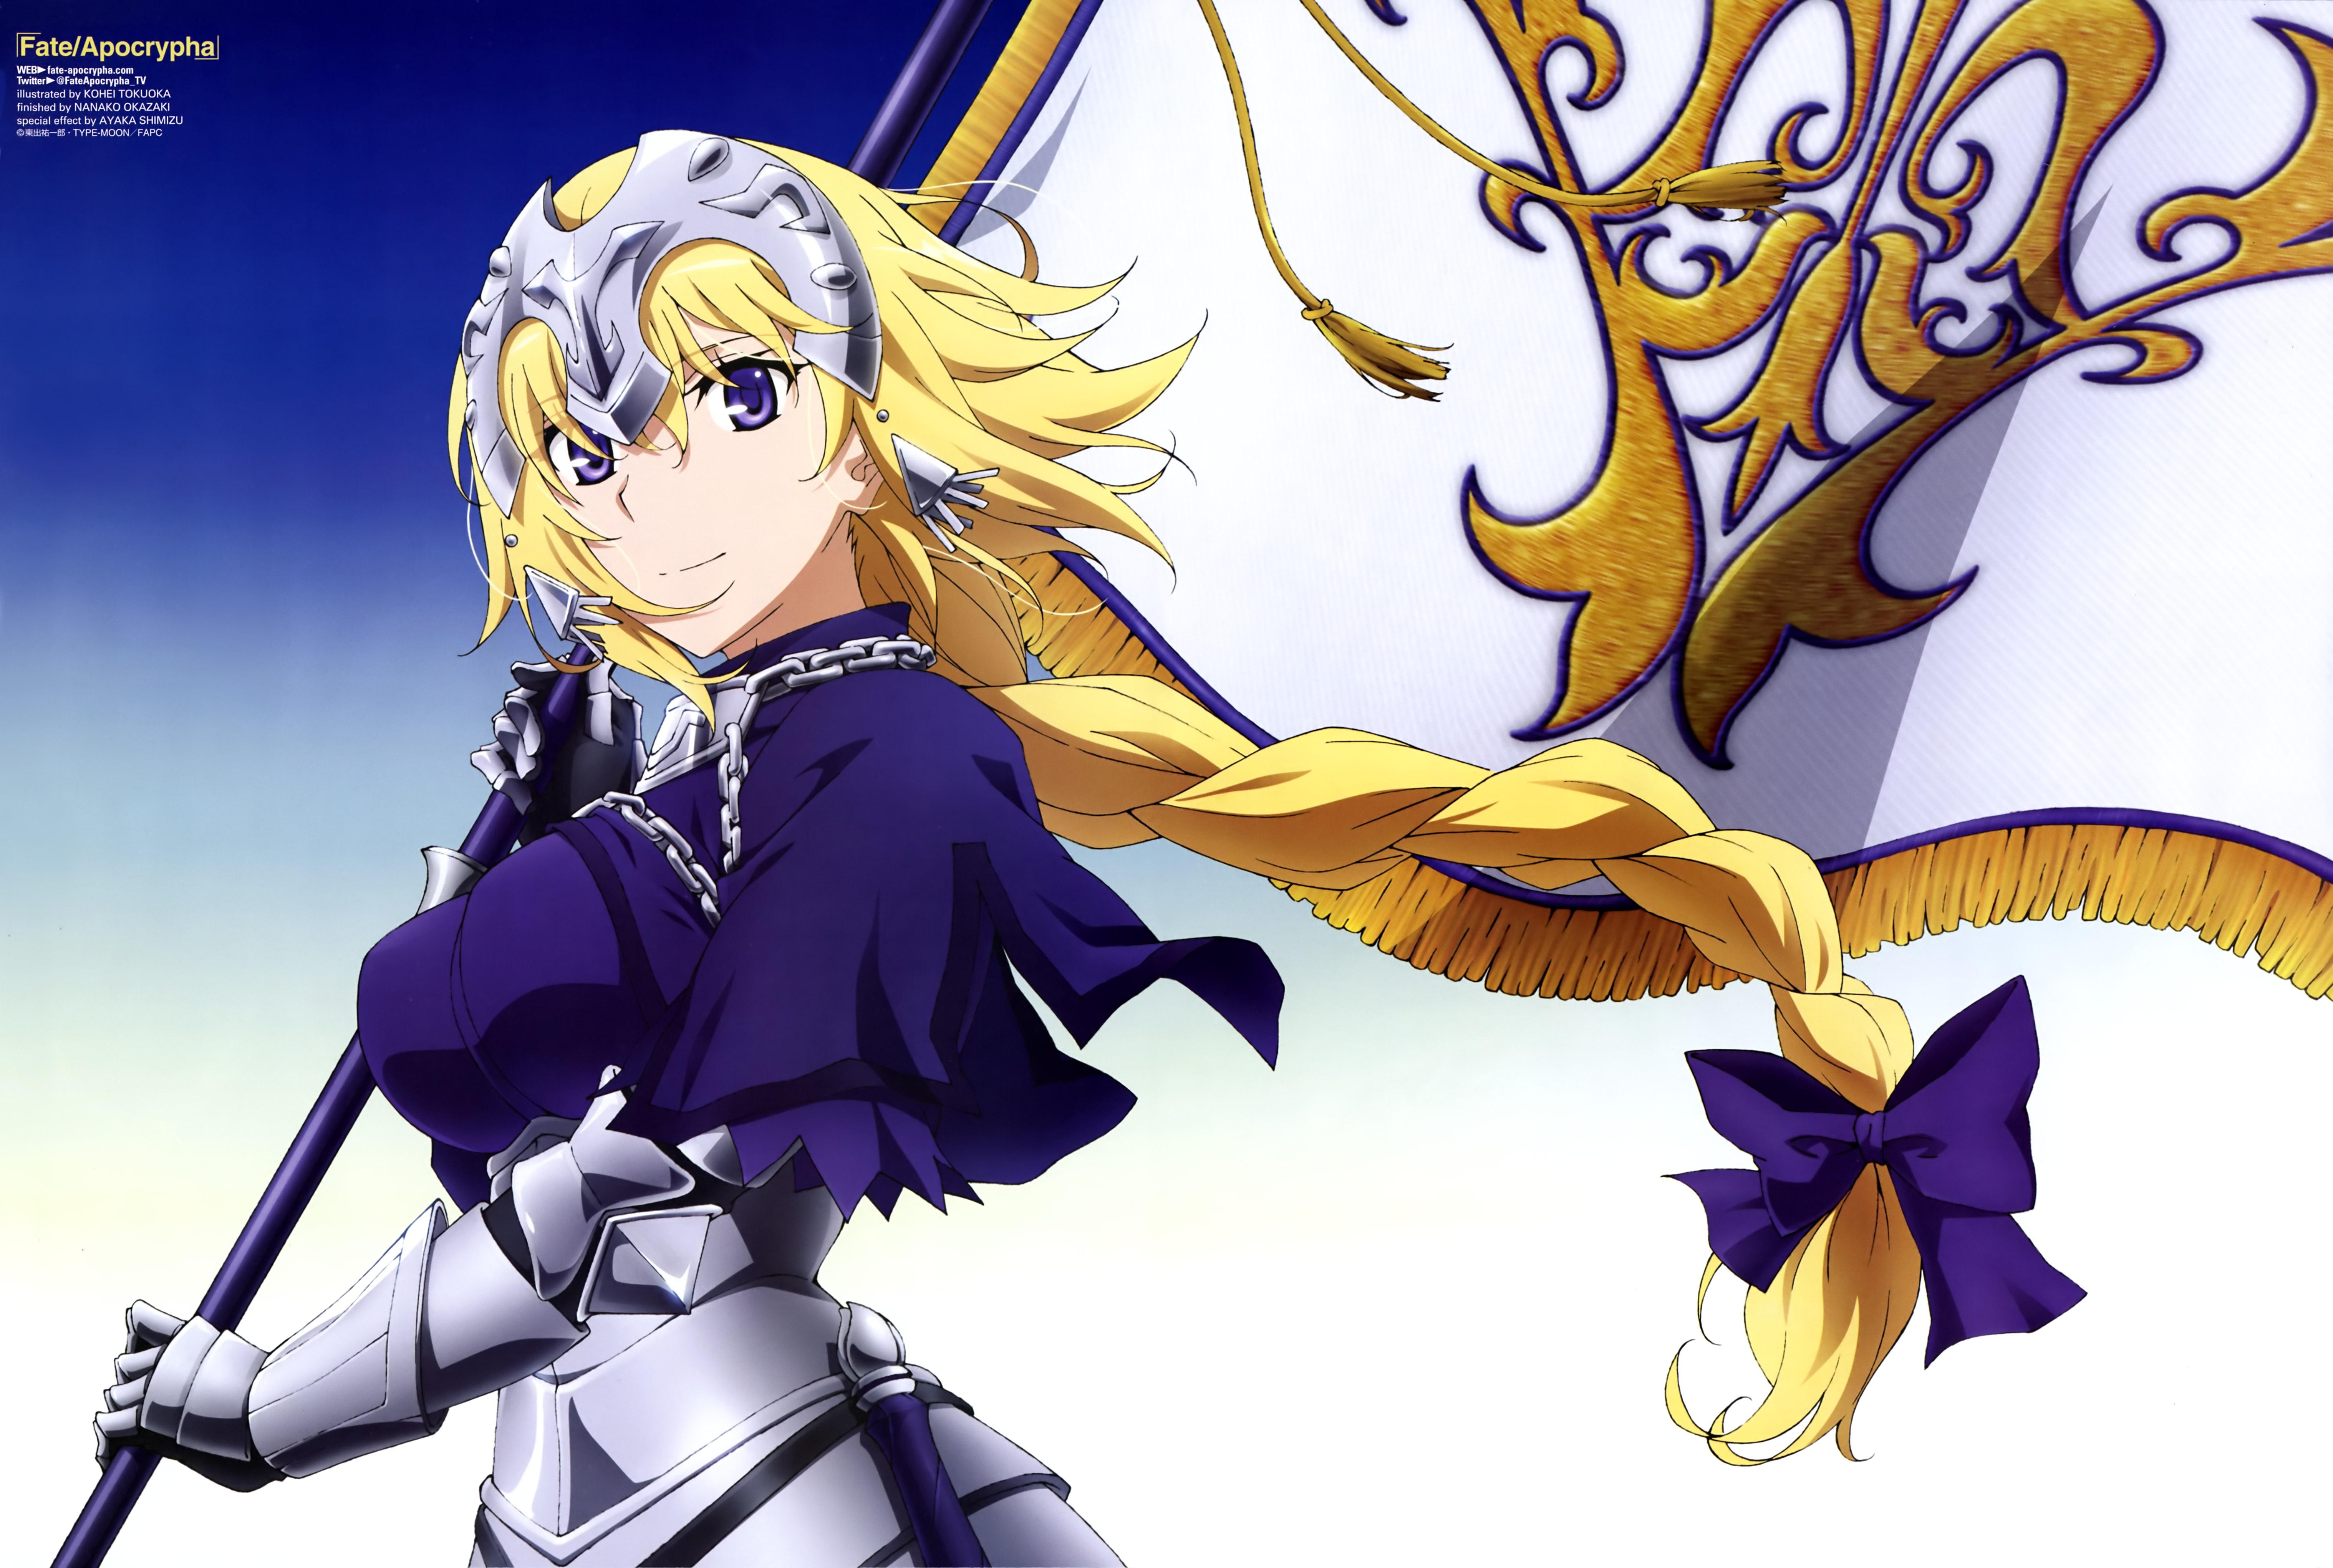 Fate Apocrypha Ruler Fate Grand Order anime girls